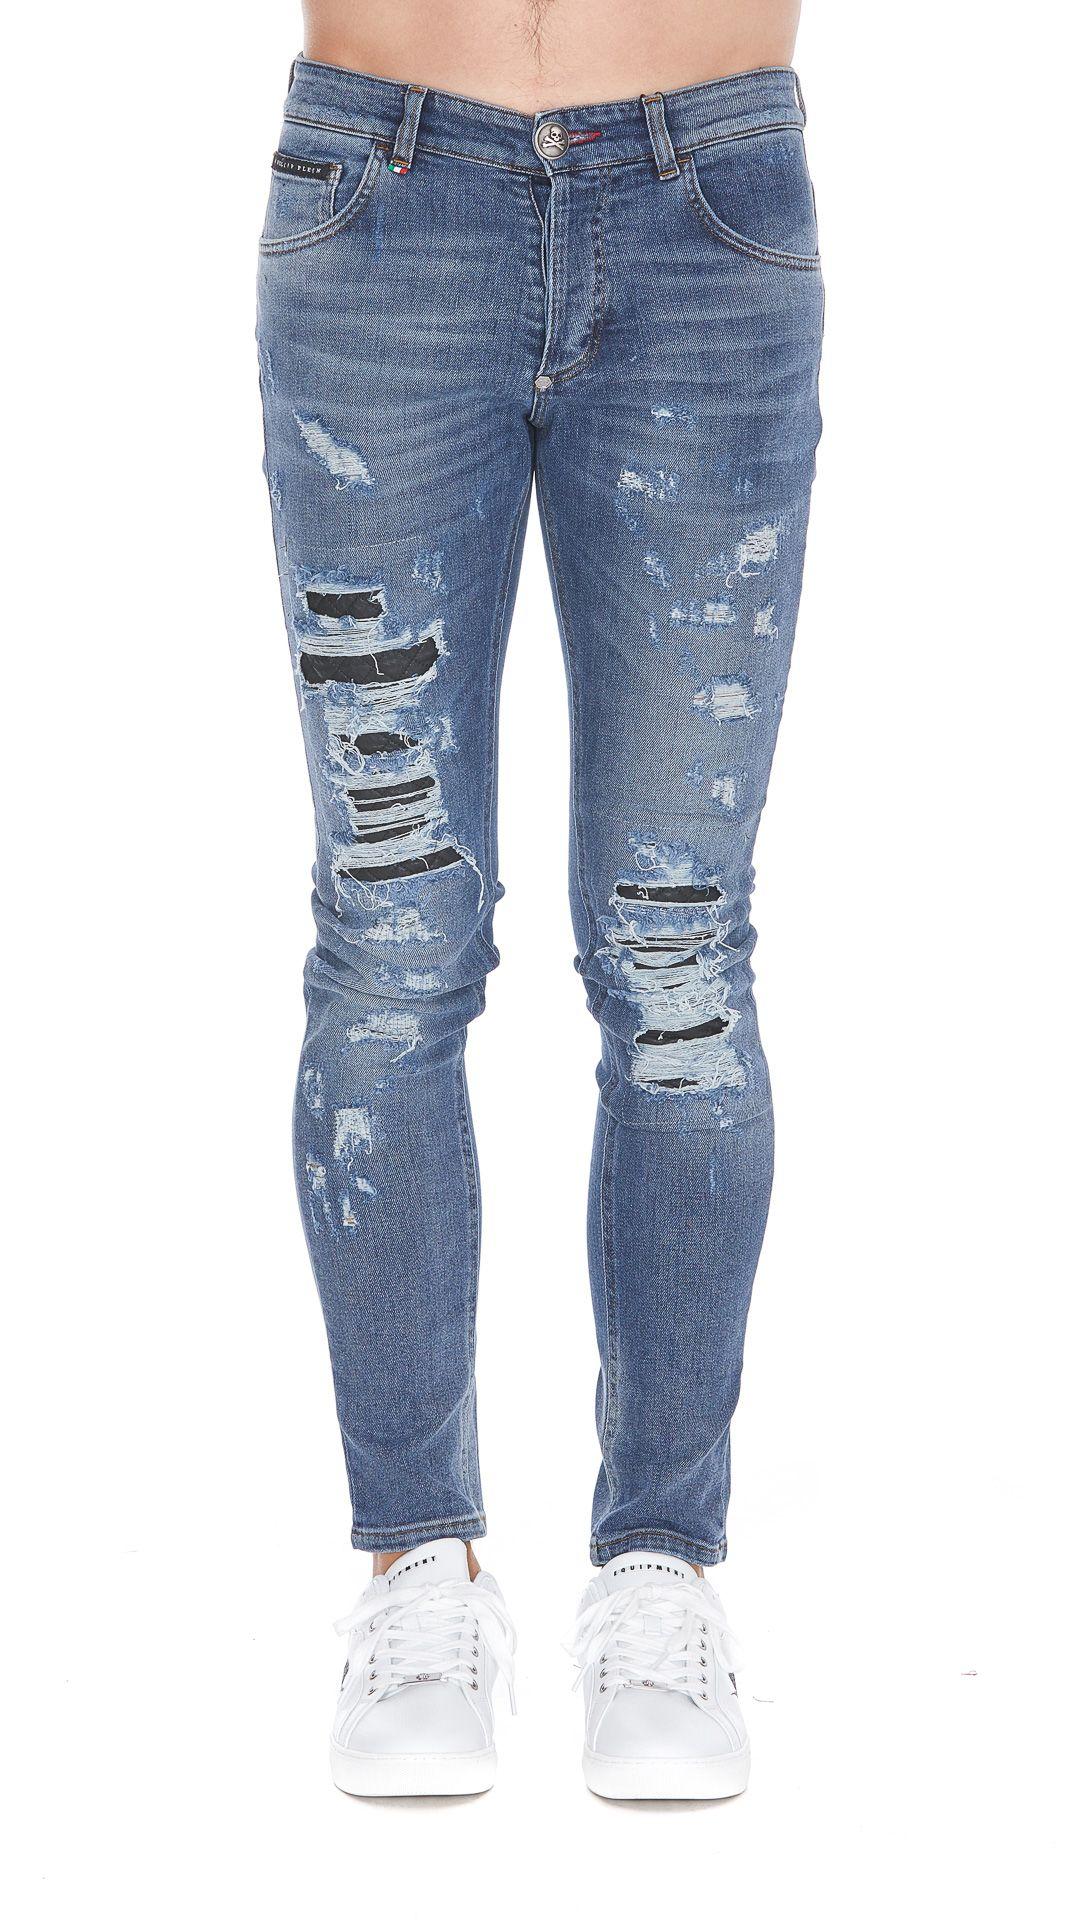 philipp plein philipp plein cange jeans upper east side men 39 s jeans italist. Black Bedroom Furniture Sets. Home Design Ideas